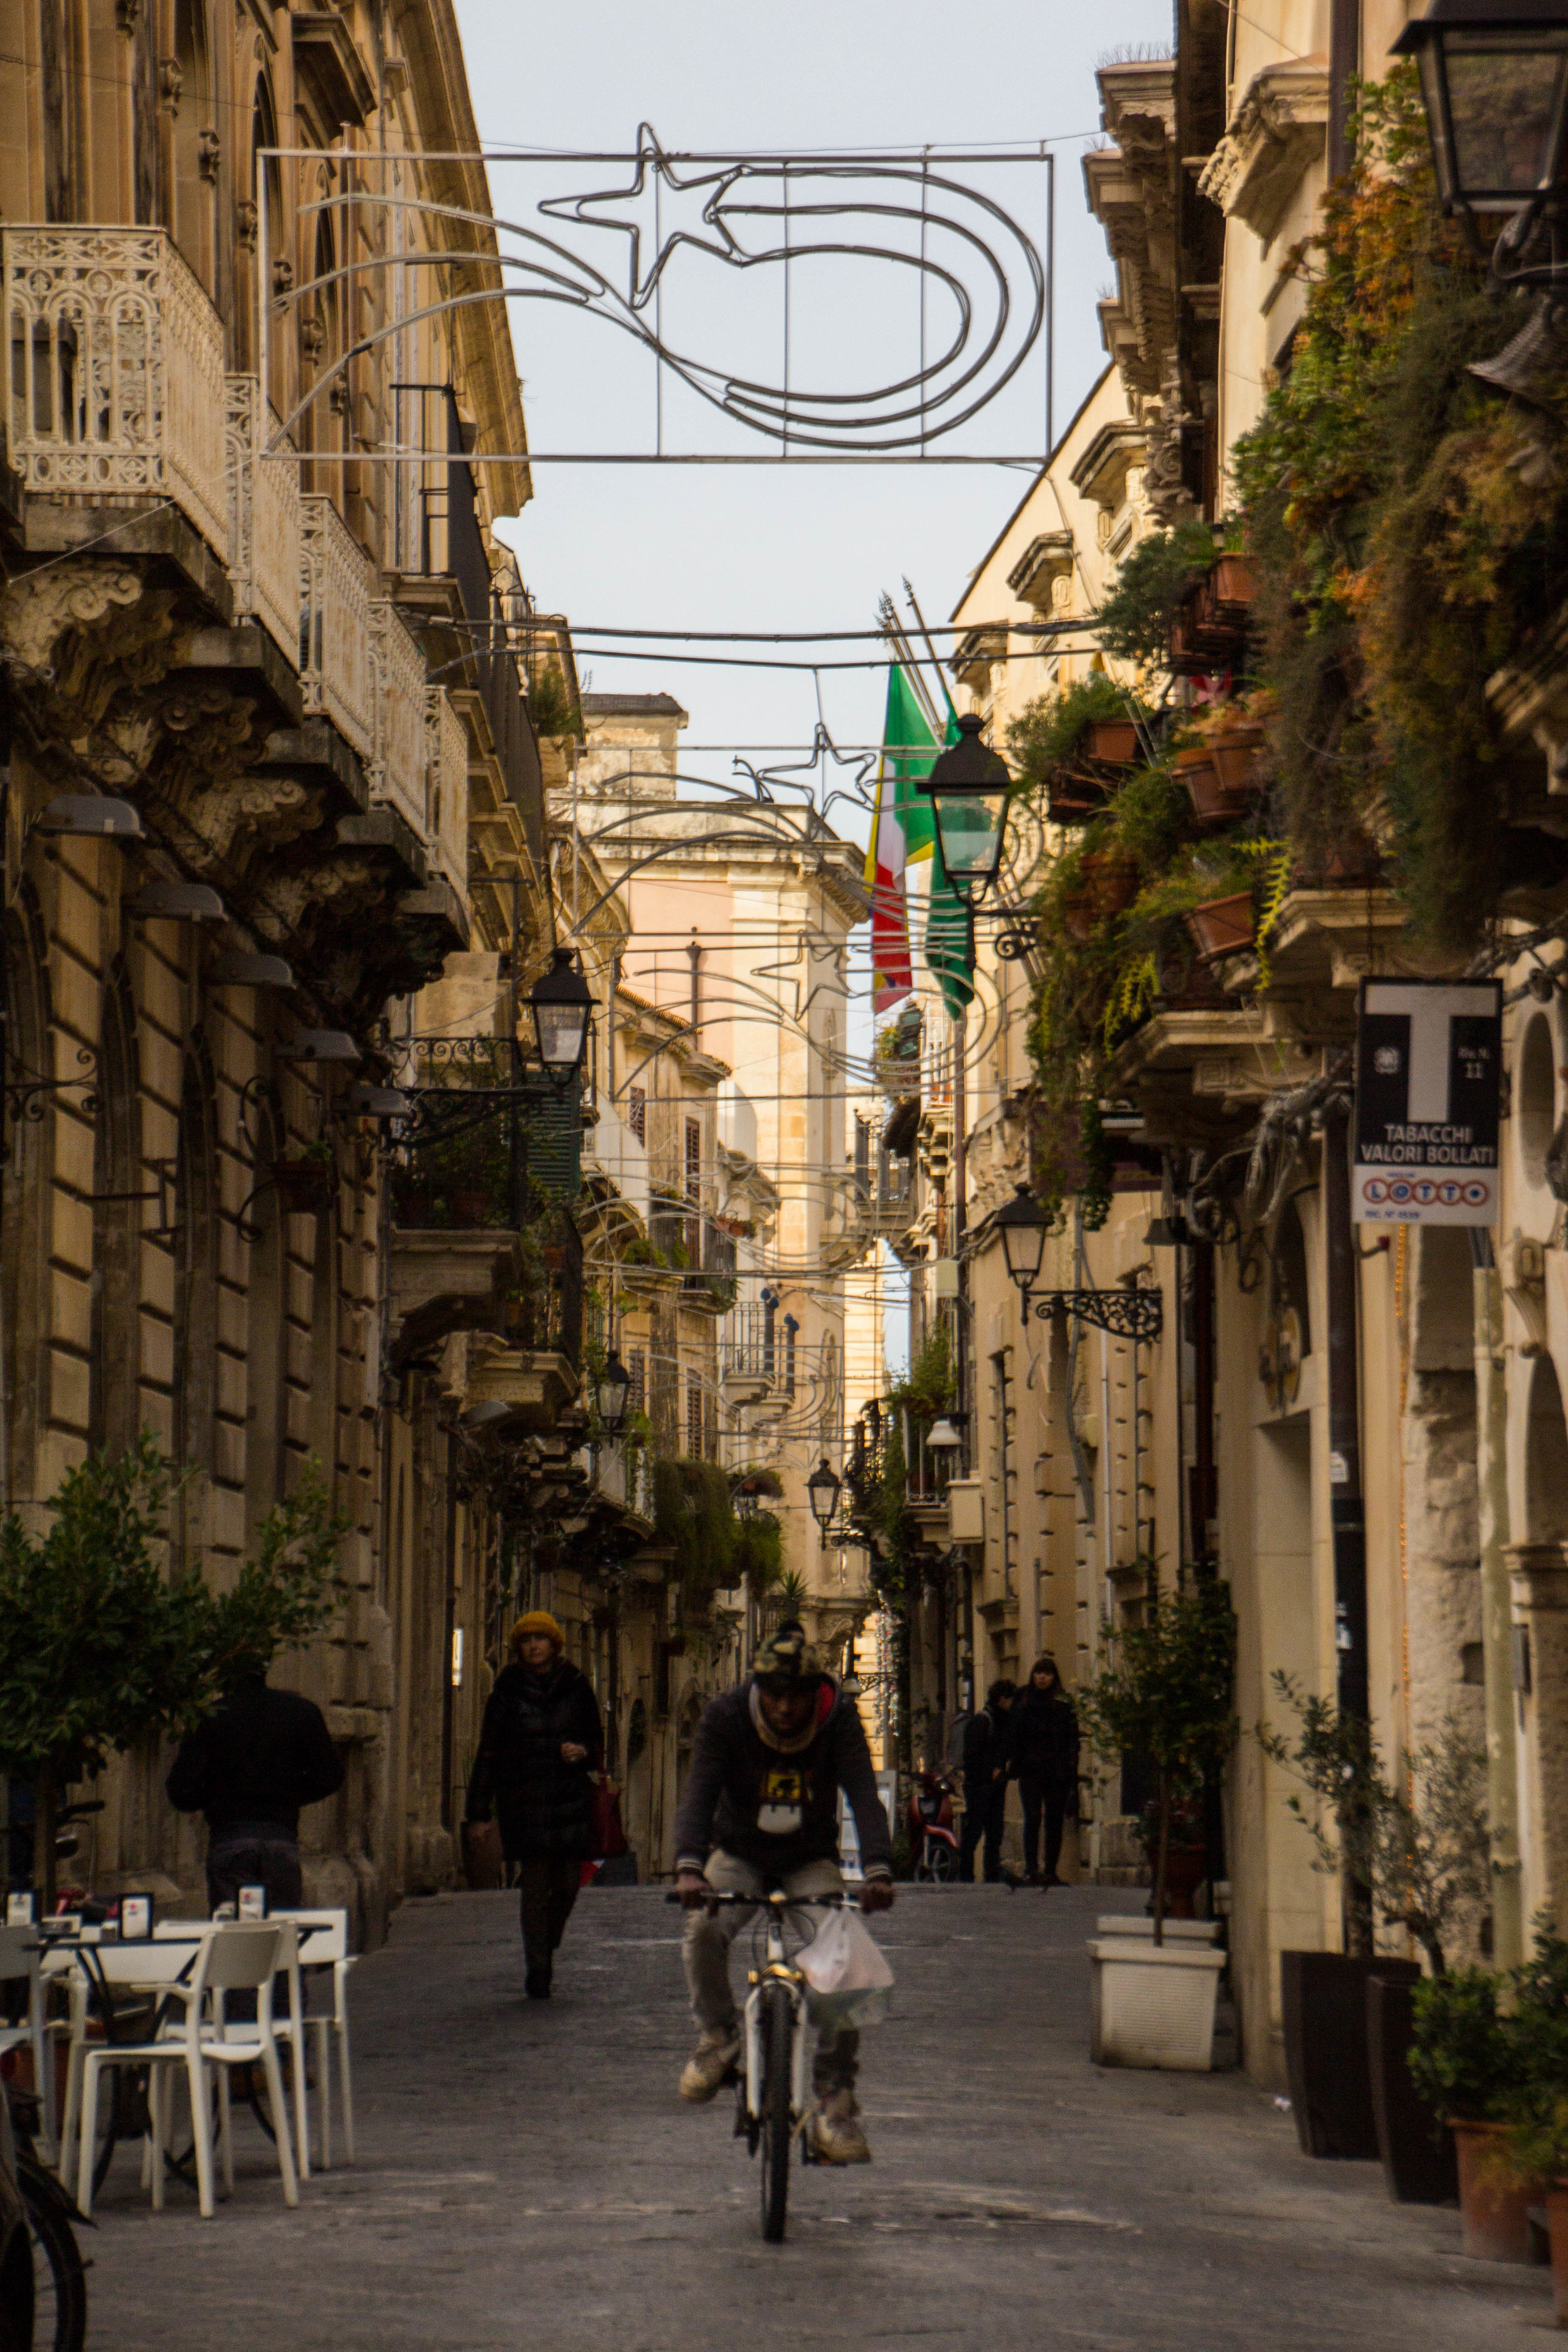 streets-ortygia-syracuse-sicily-39.jpg